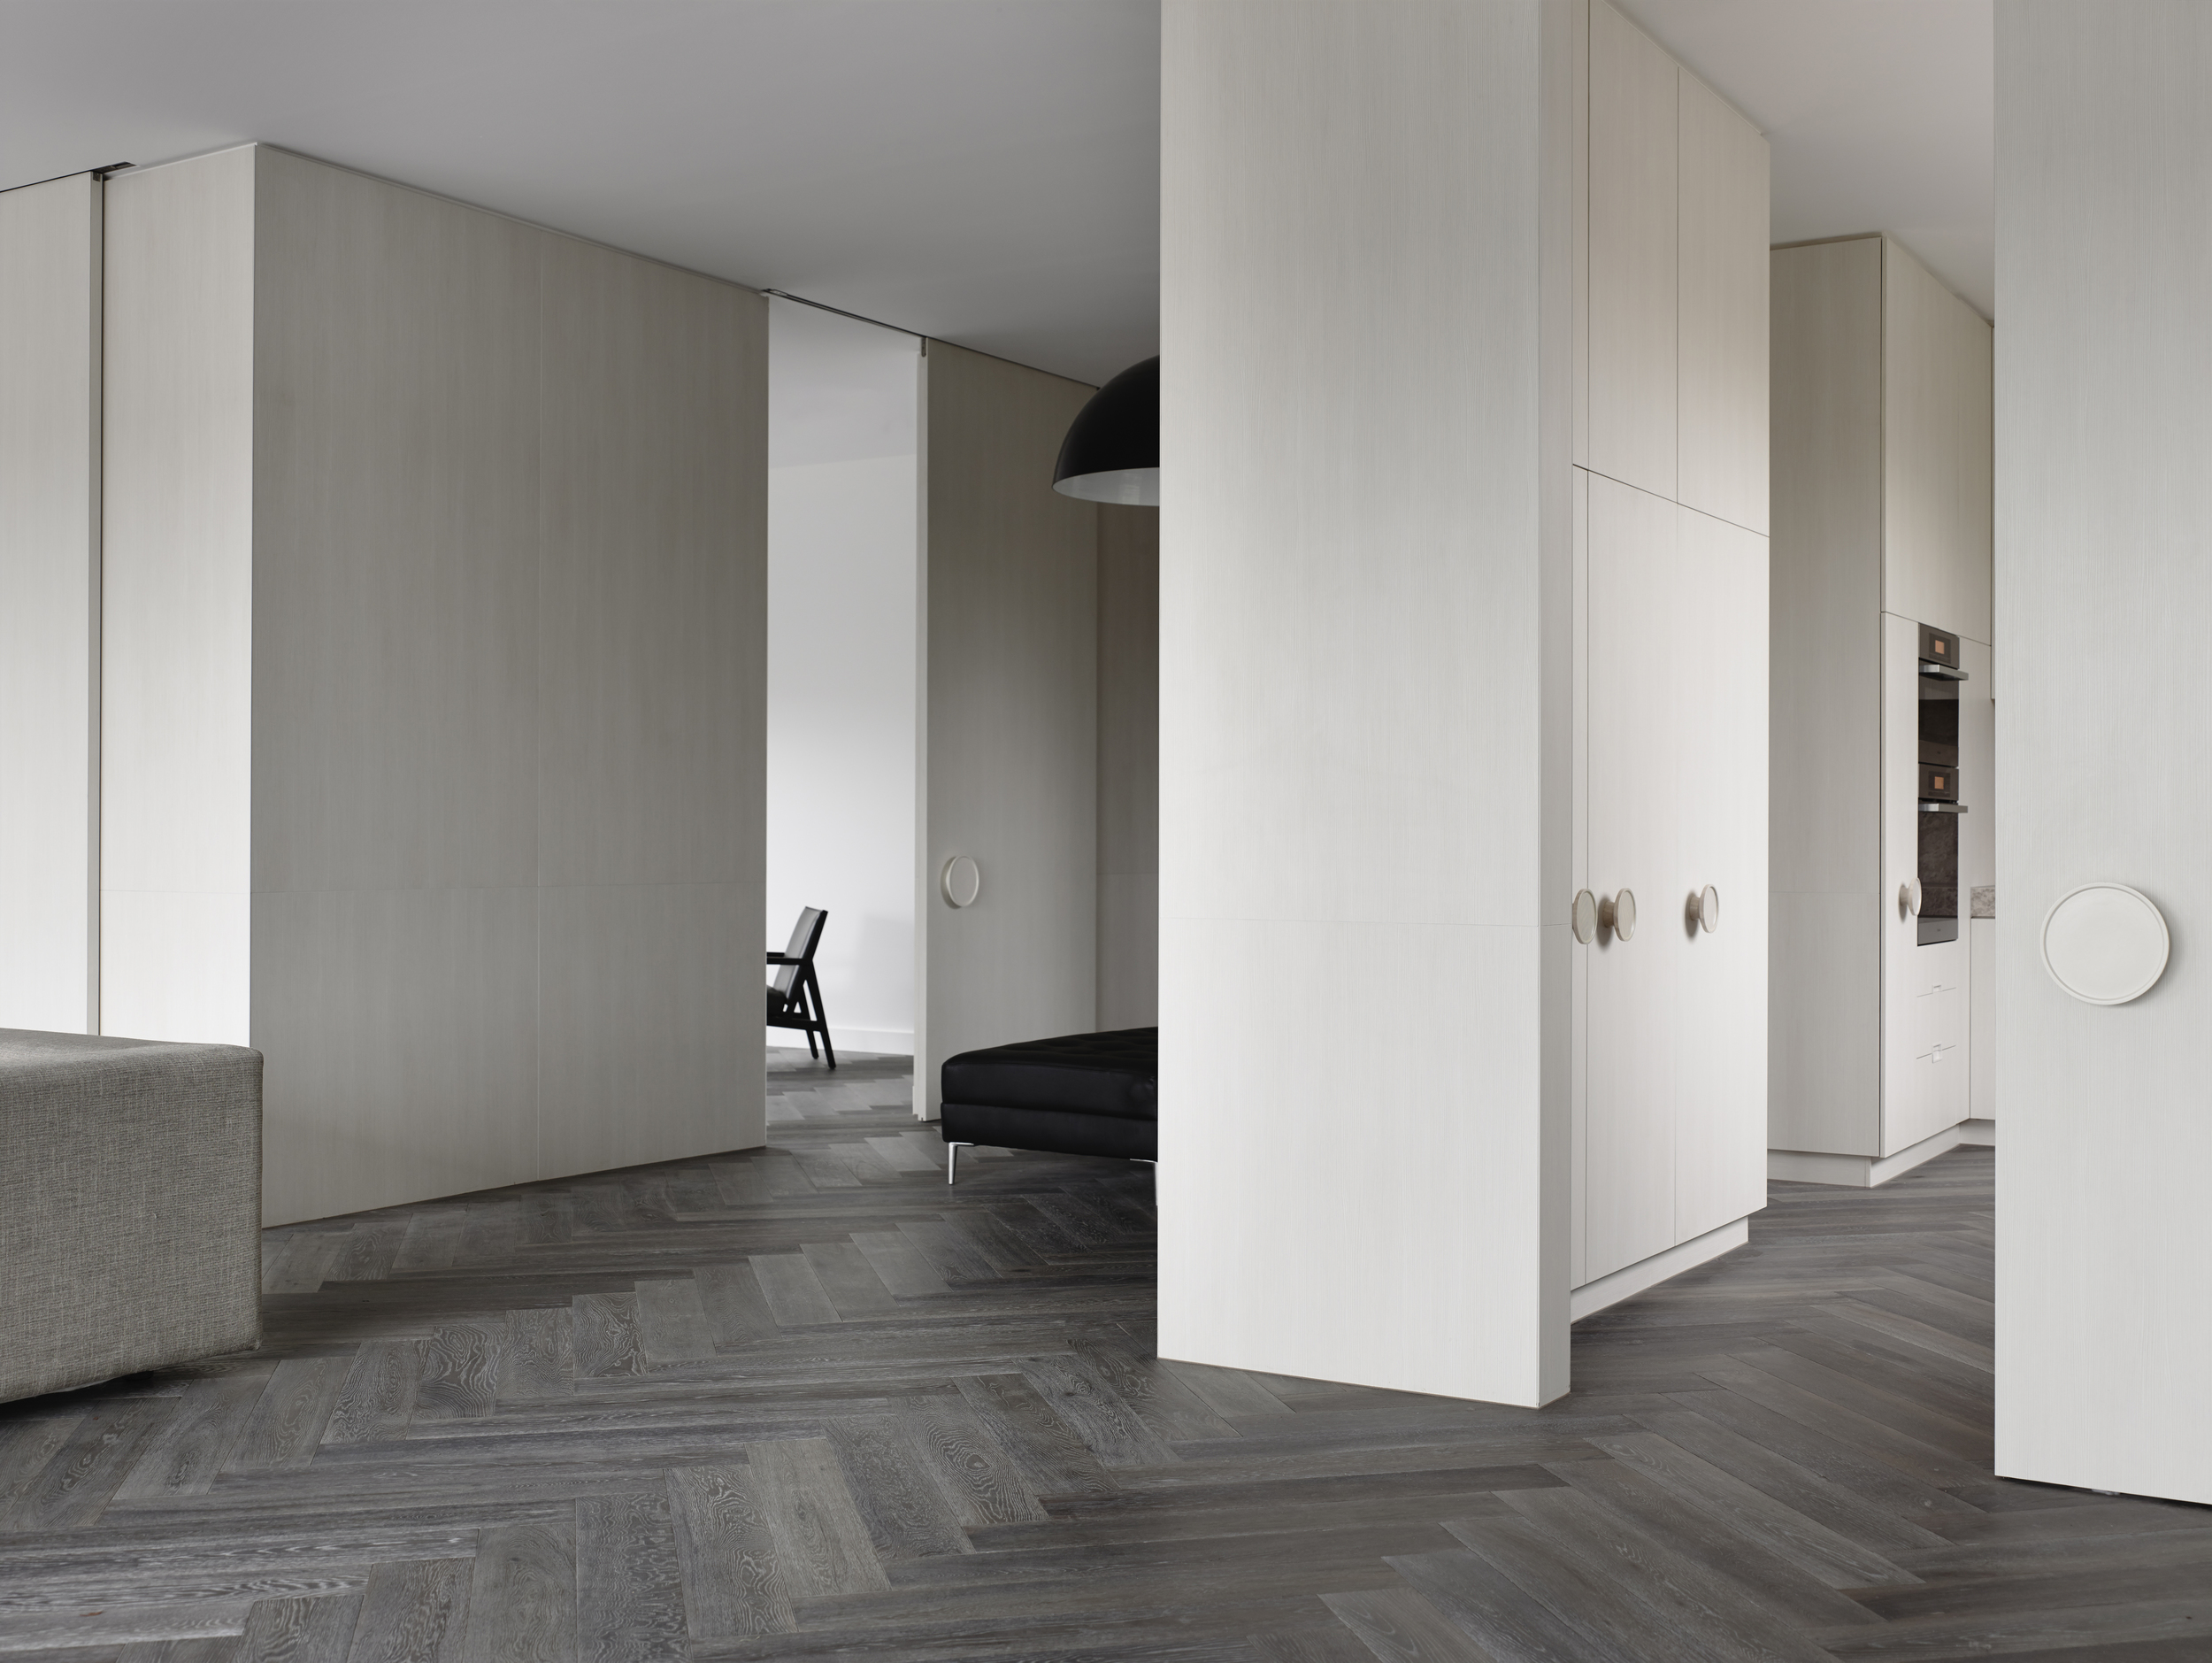 Chamberlain Architects - Washington Street